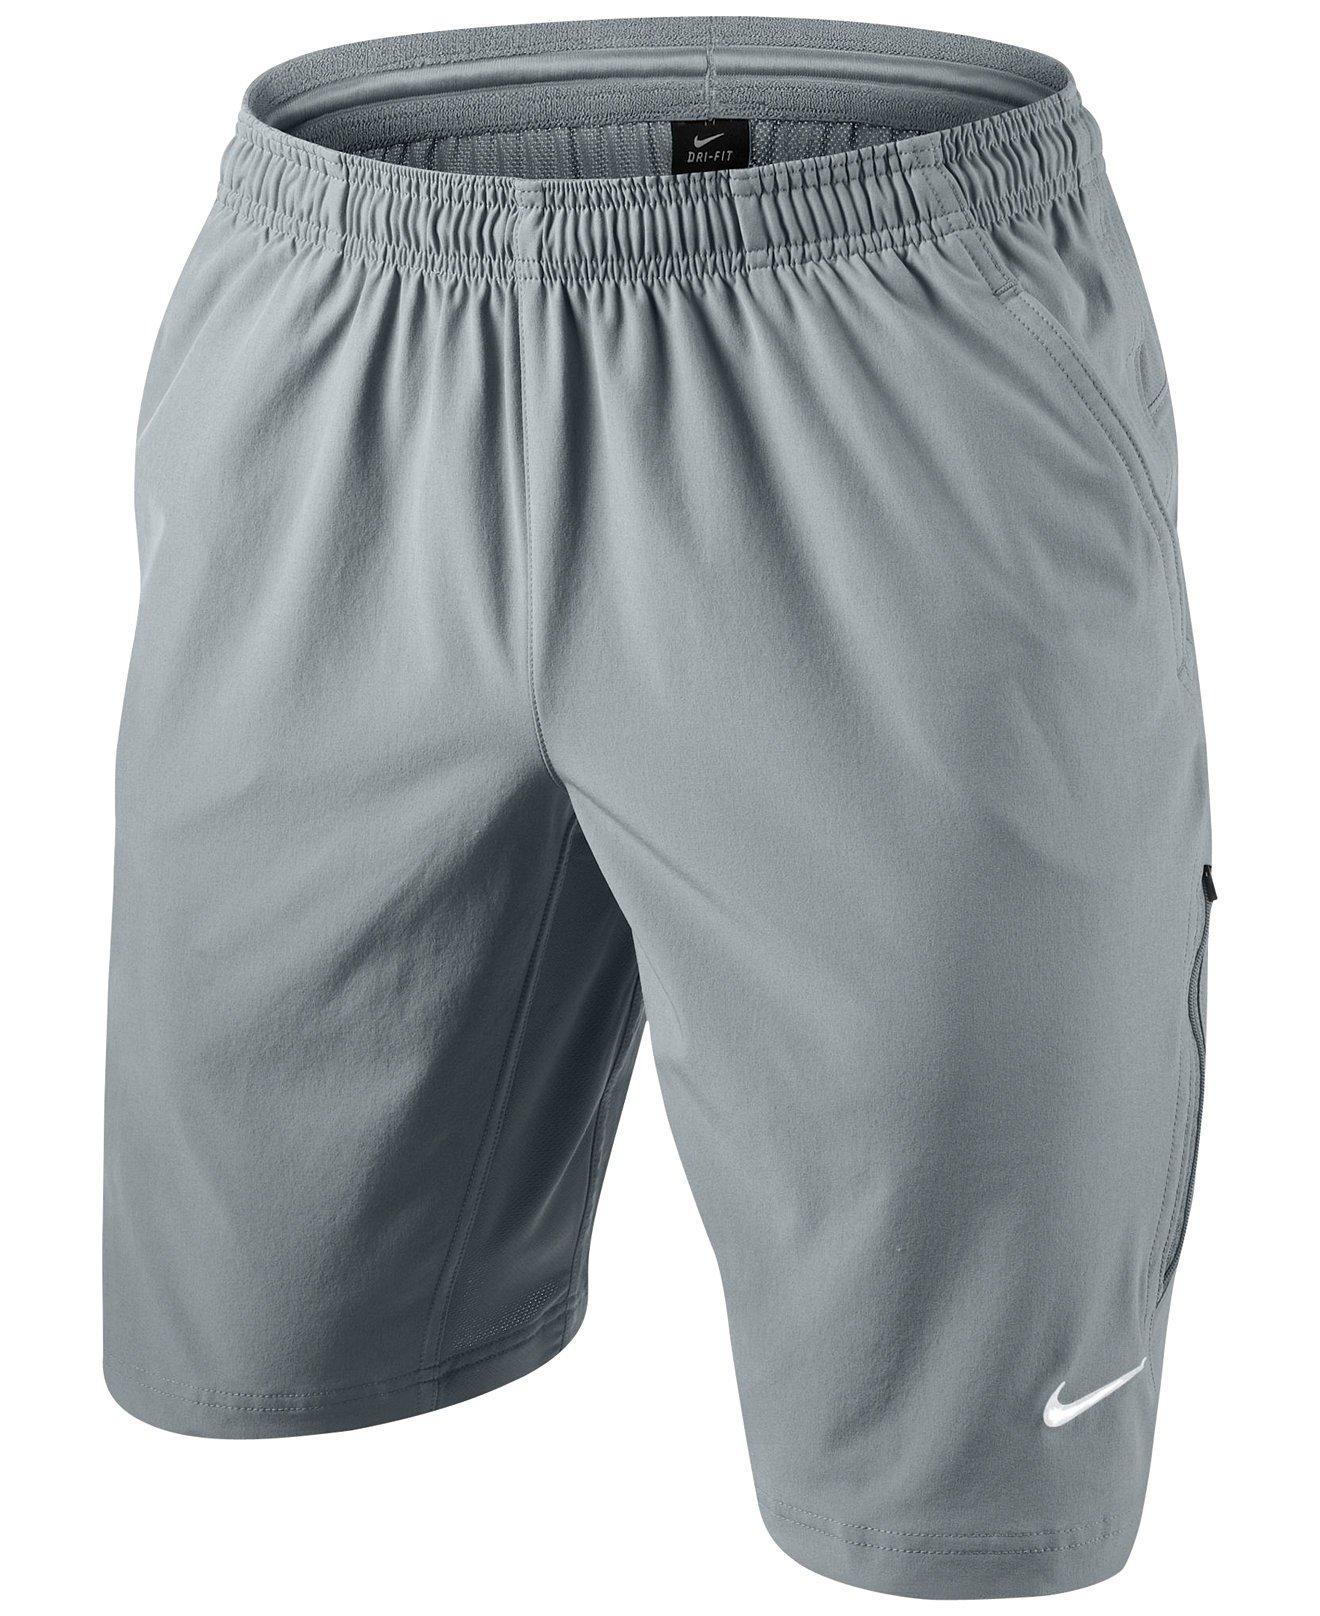 Nike Men's Dri-FIT Woven Tennis Short (Medium, Stadium Grey/White)